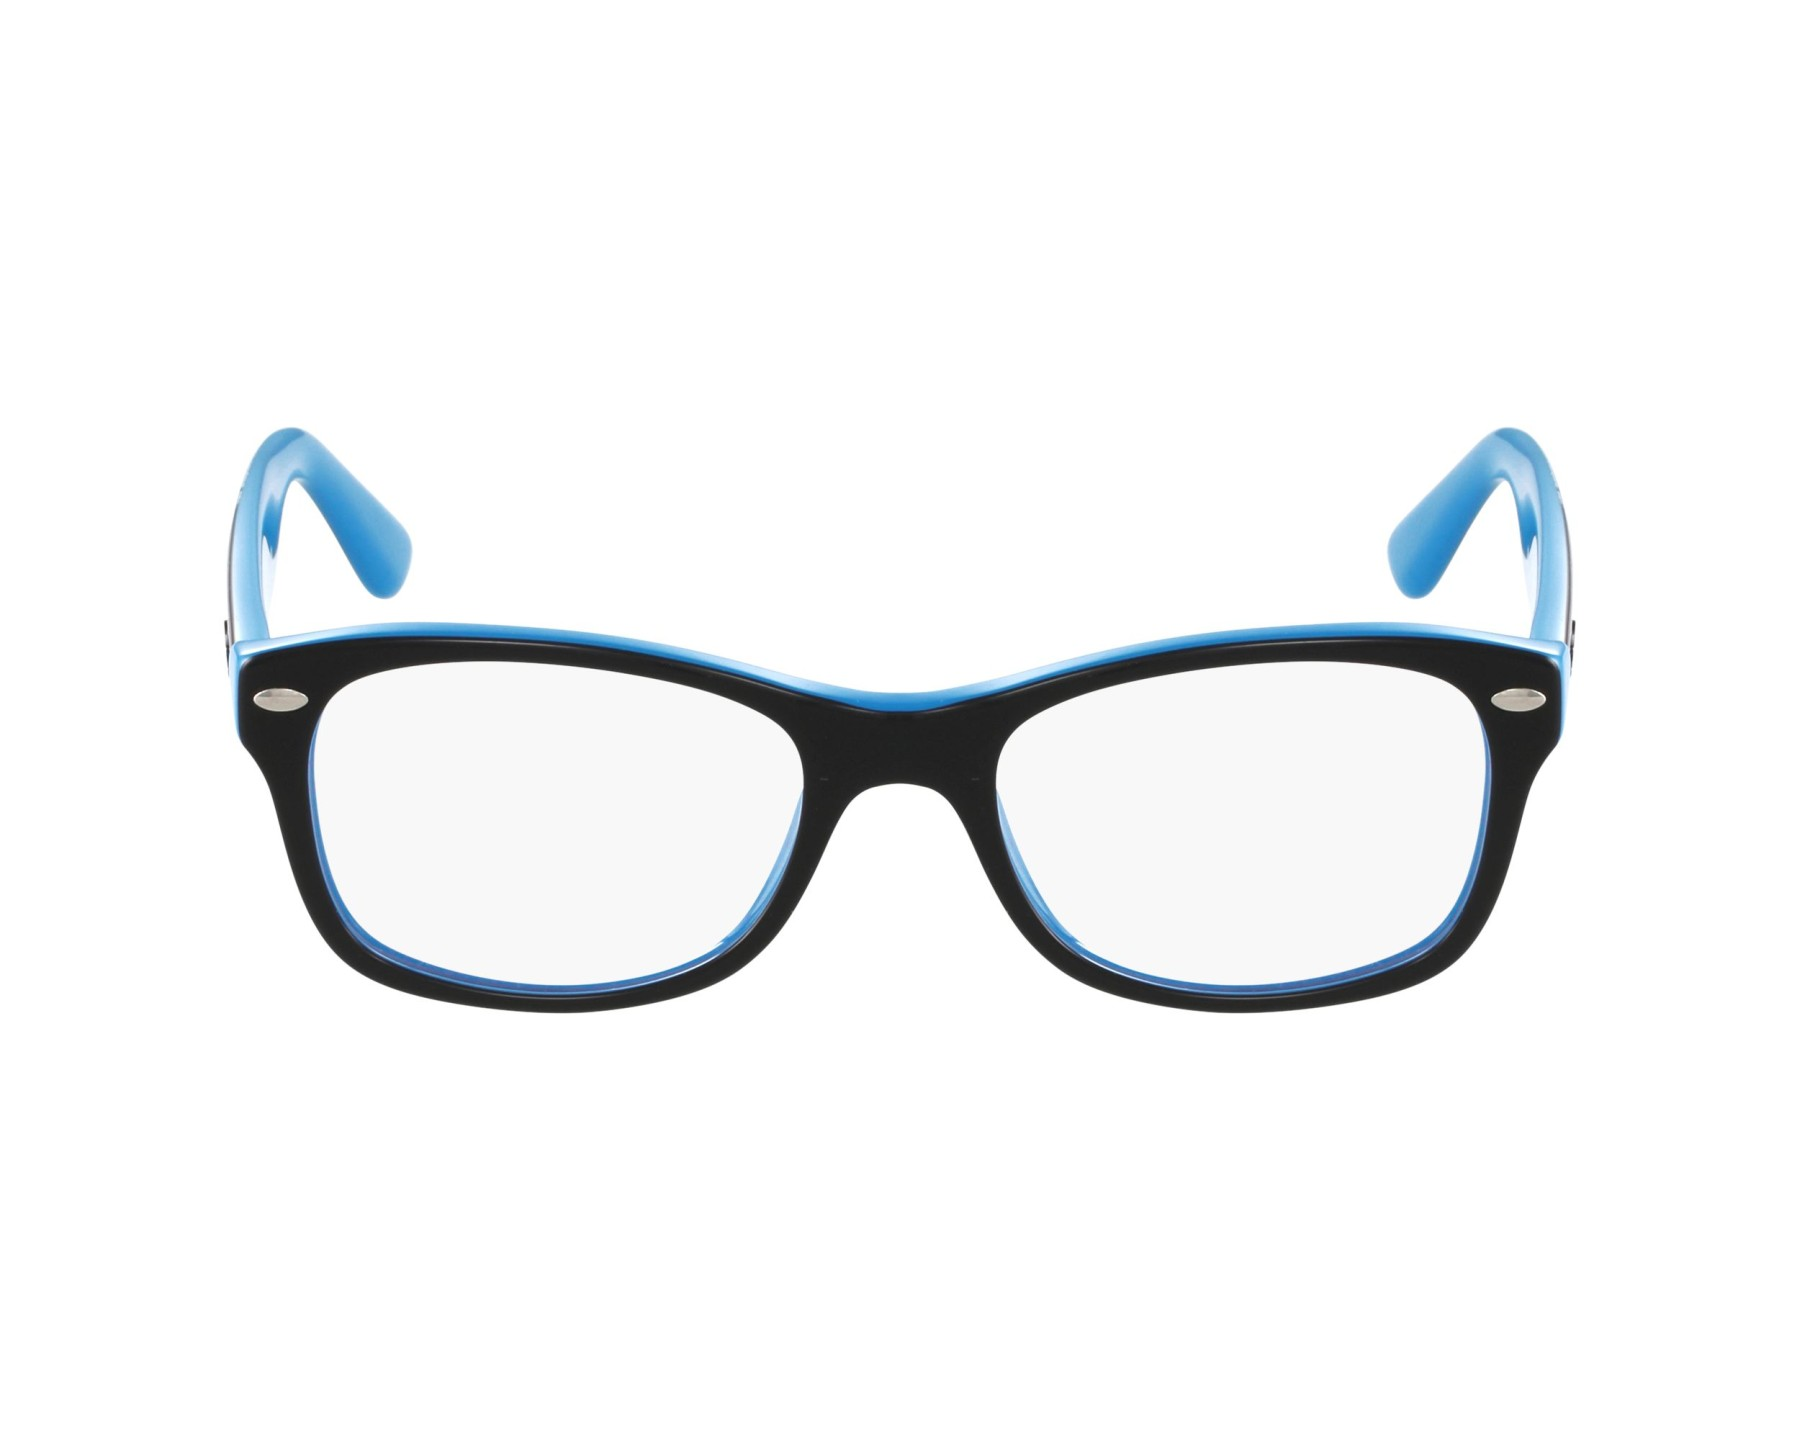 ba85761dc2 eyeglasses Ray-Ban RY-1528 3659 - Black Blue profile view